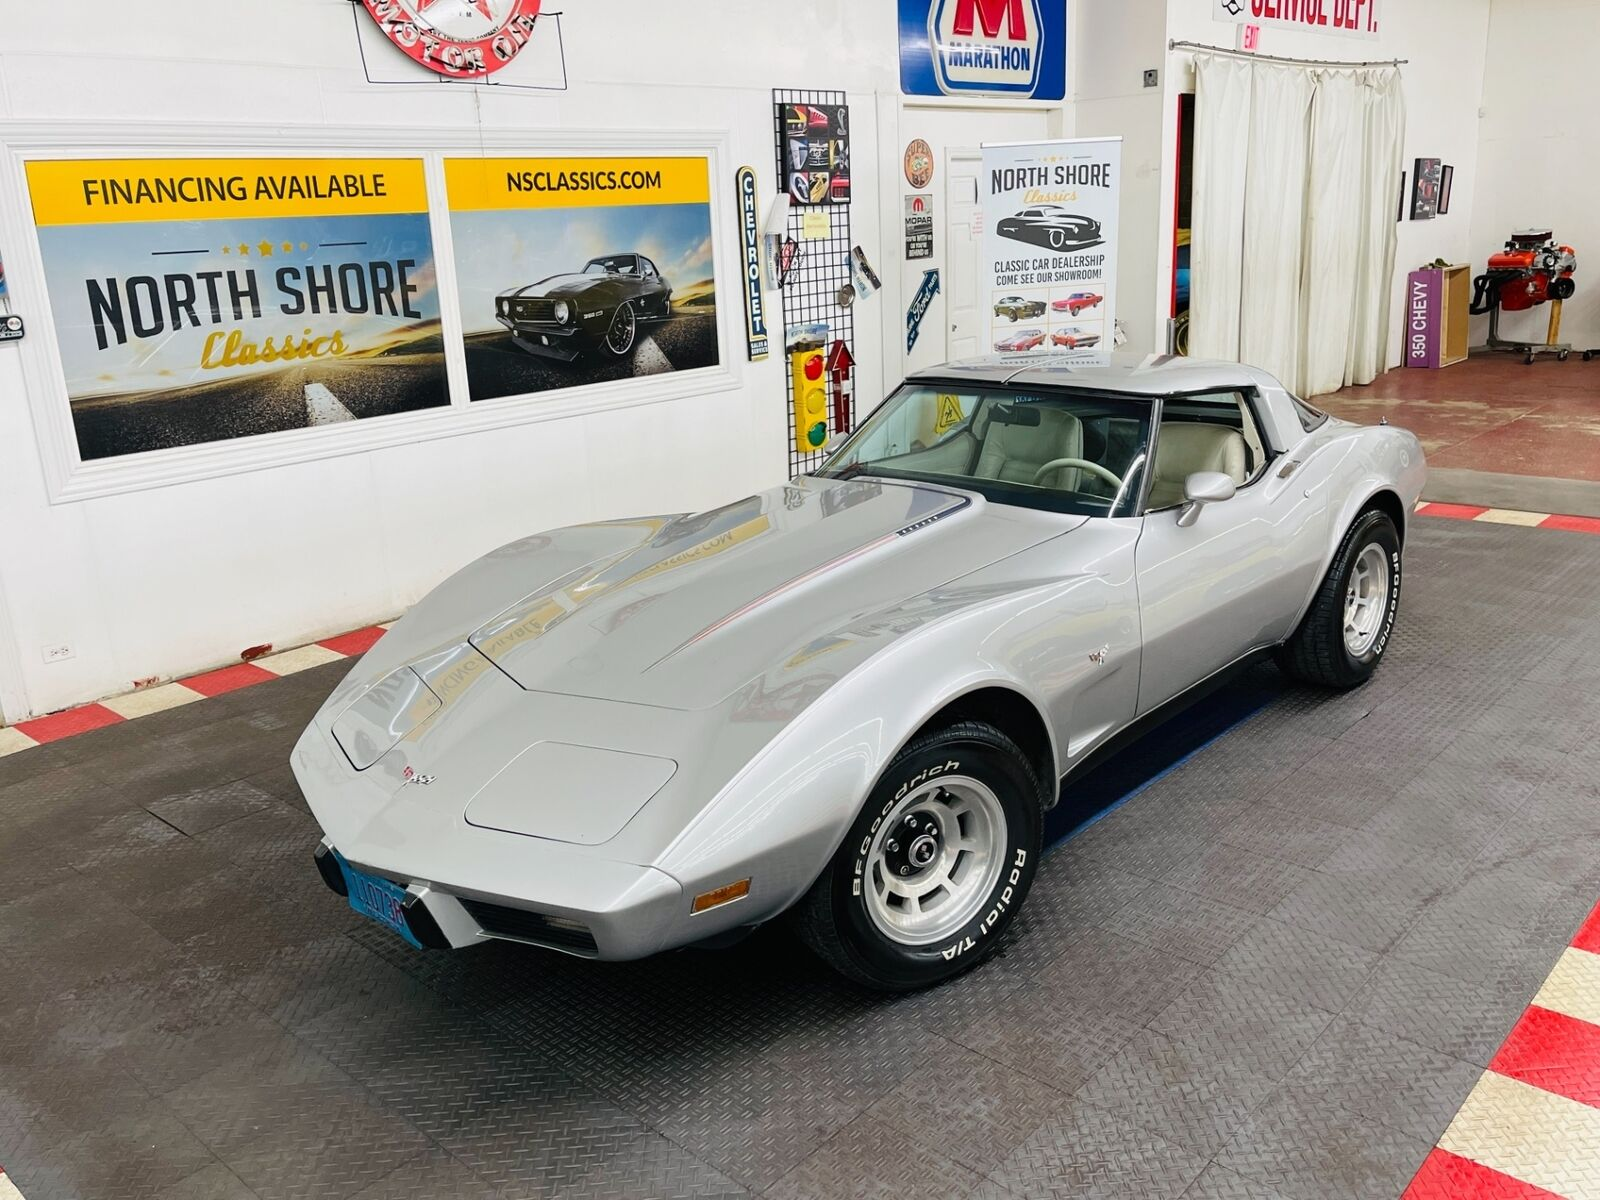 1979 Silver Chevrolet Corvette   | C3 Corvette Photo 1